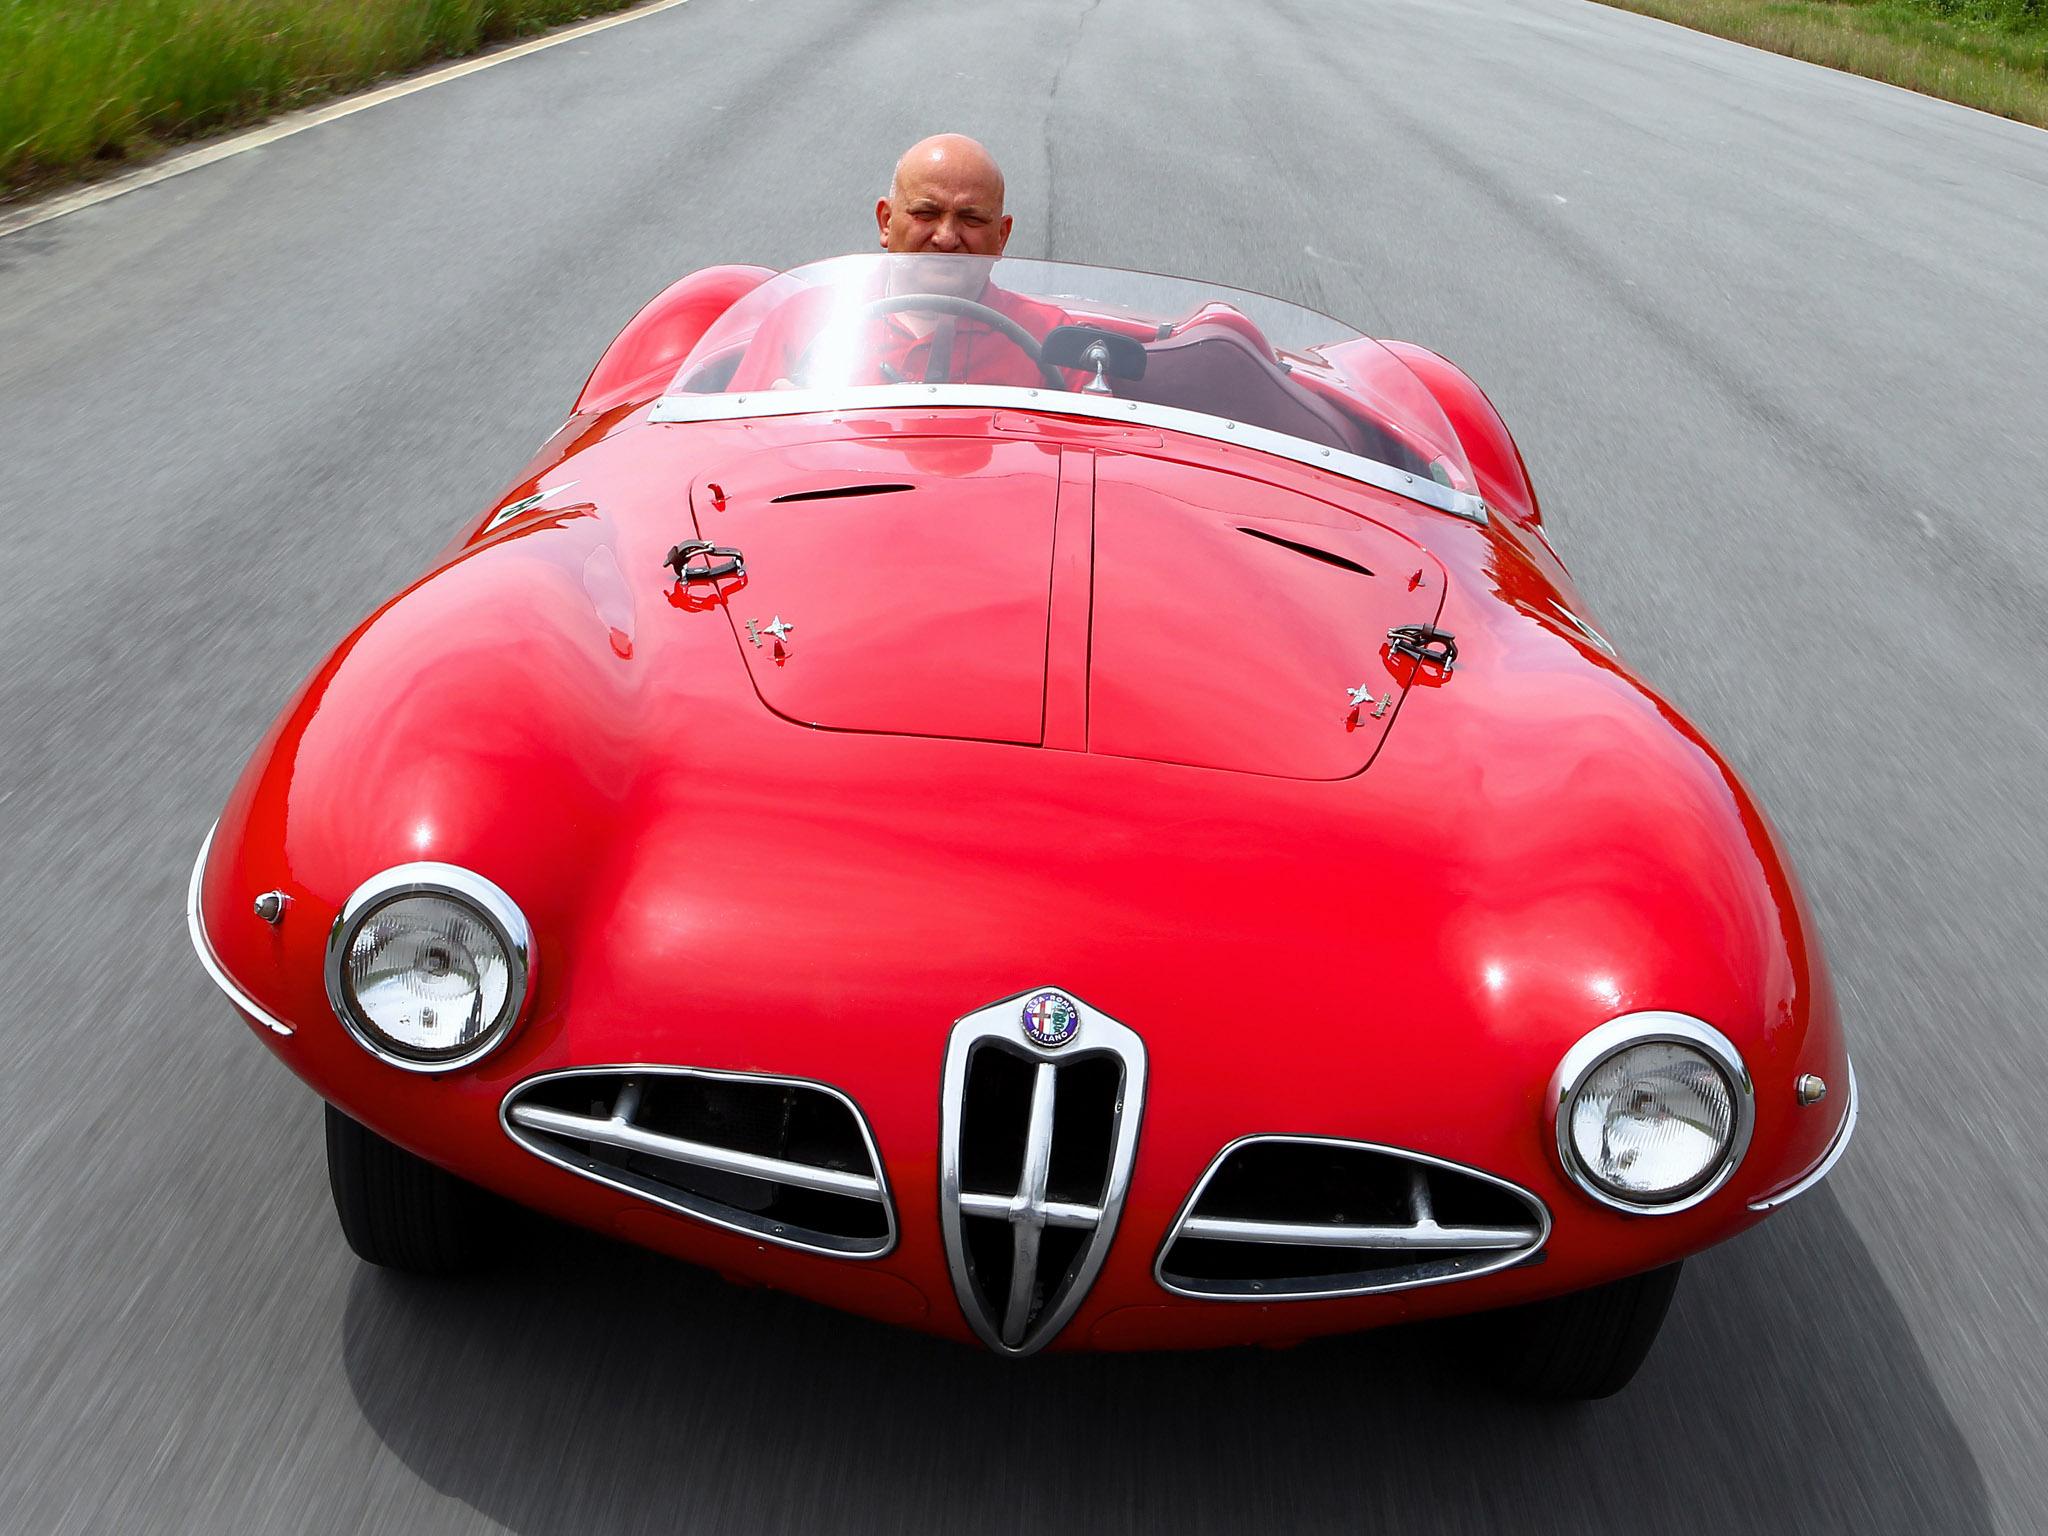 Alfa Romeo Gtv Car Battery What Size